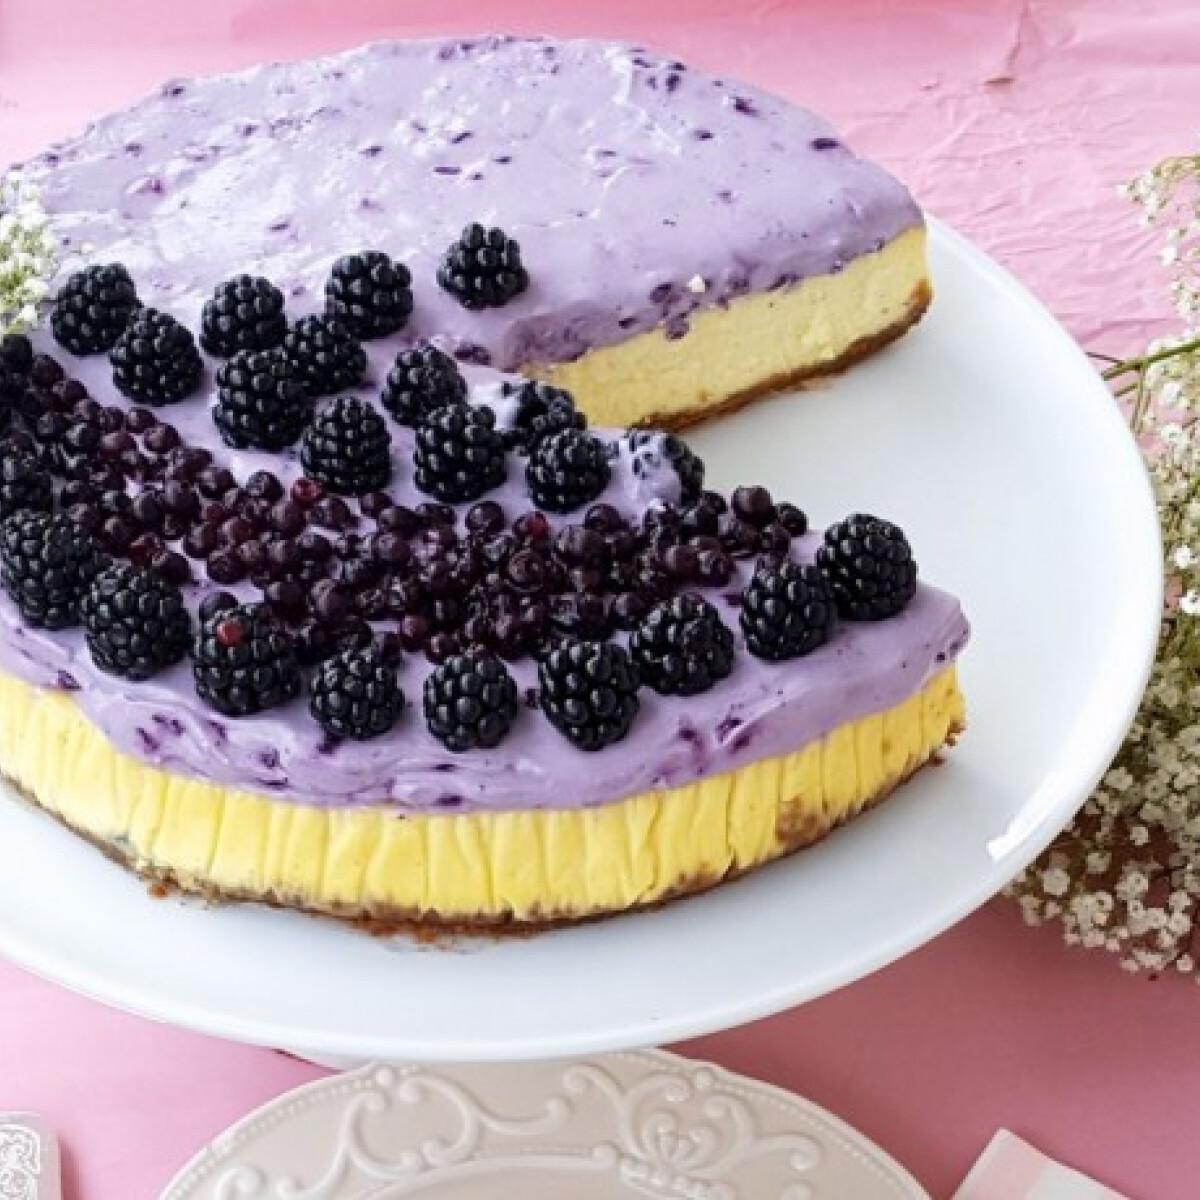 Áfonyahabos cheesecake